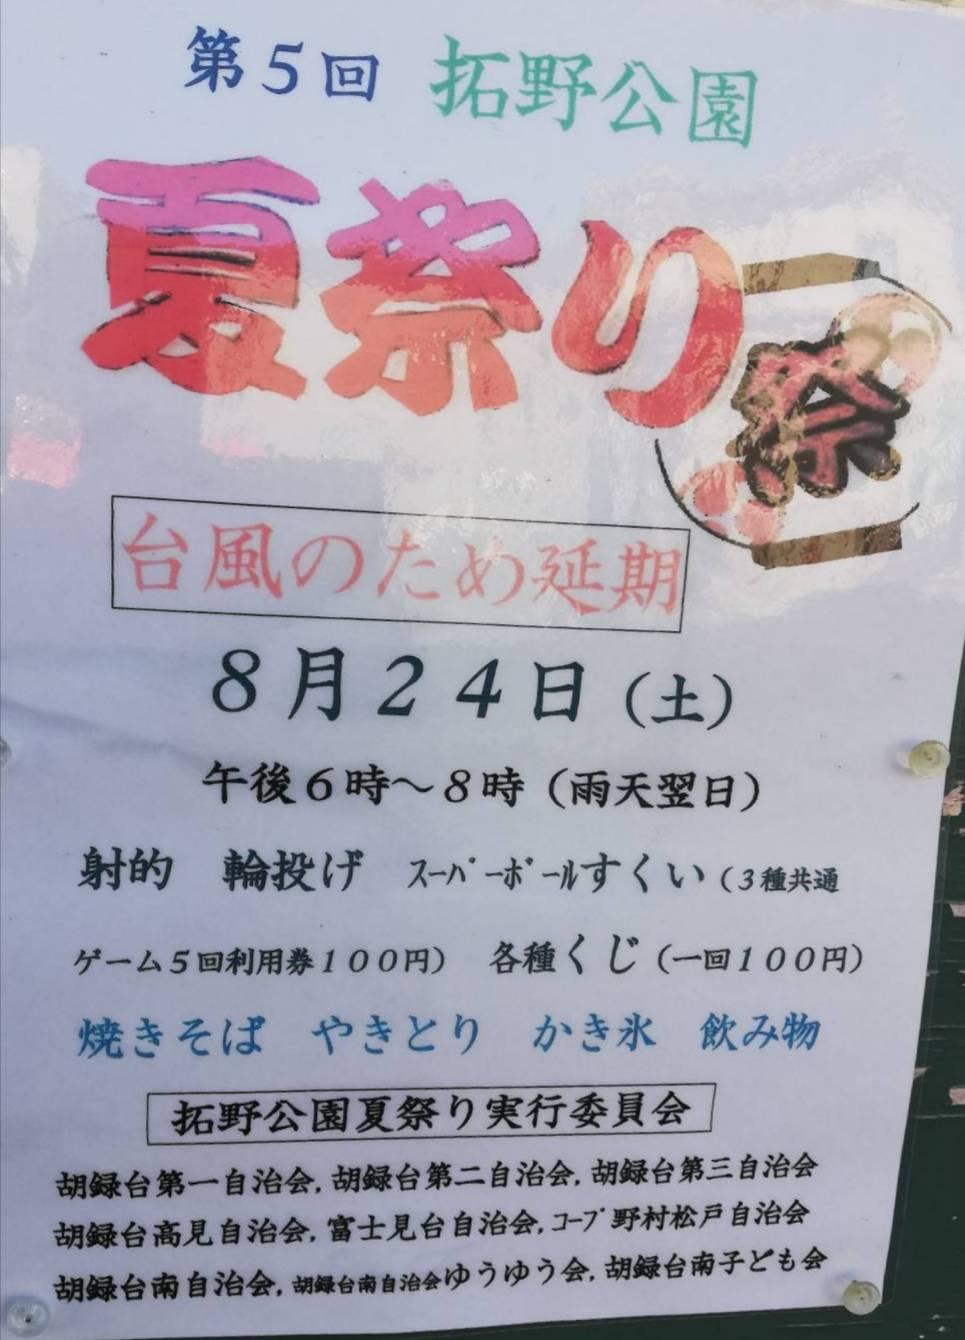 拓野公園夏祭り延期